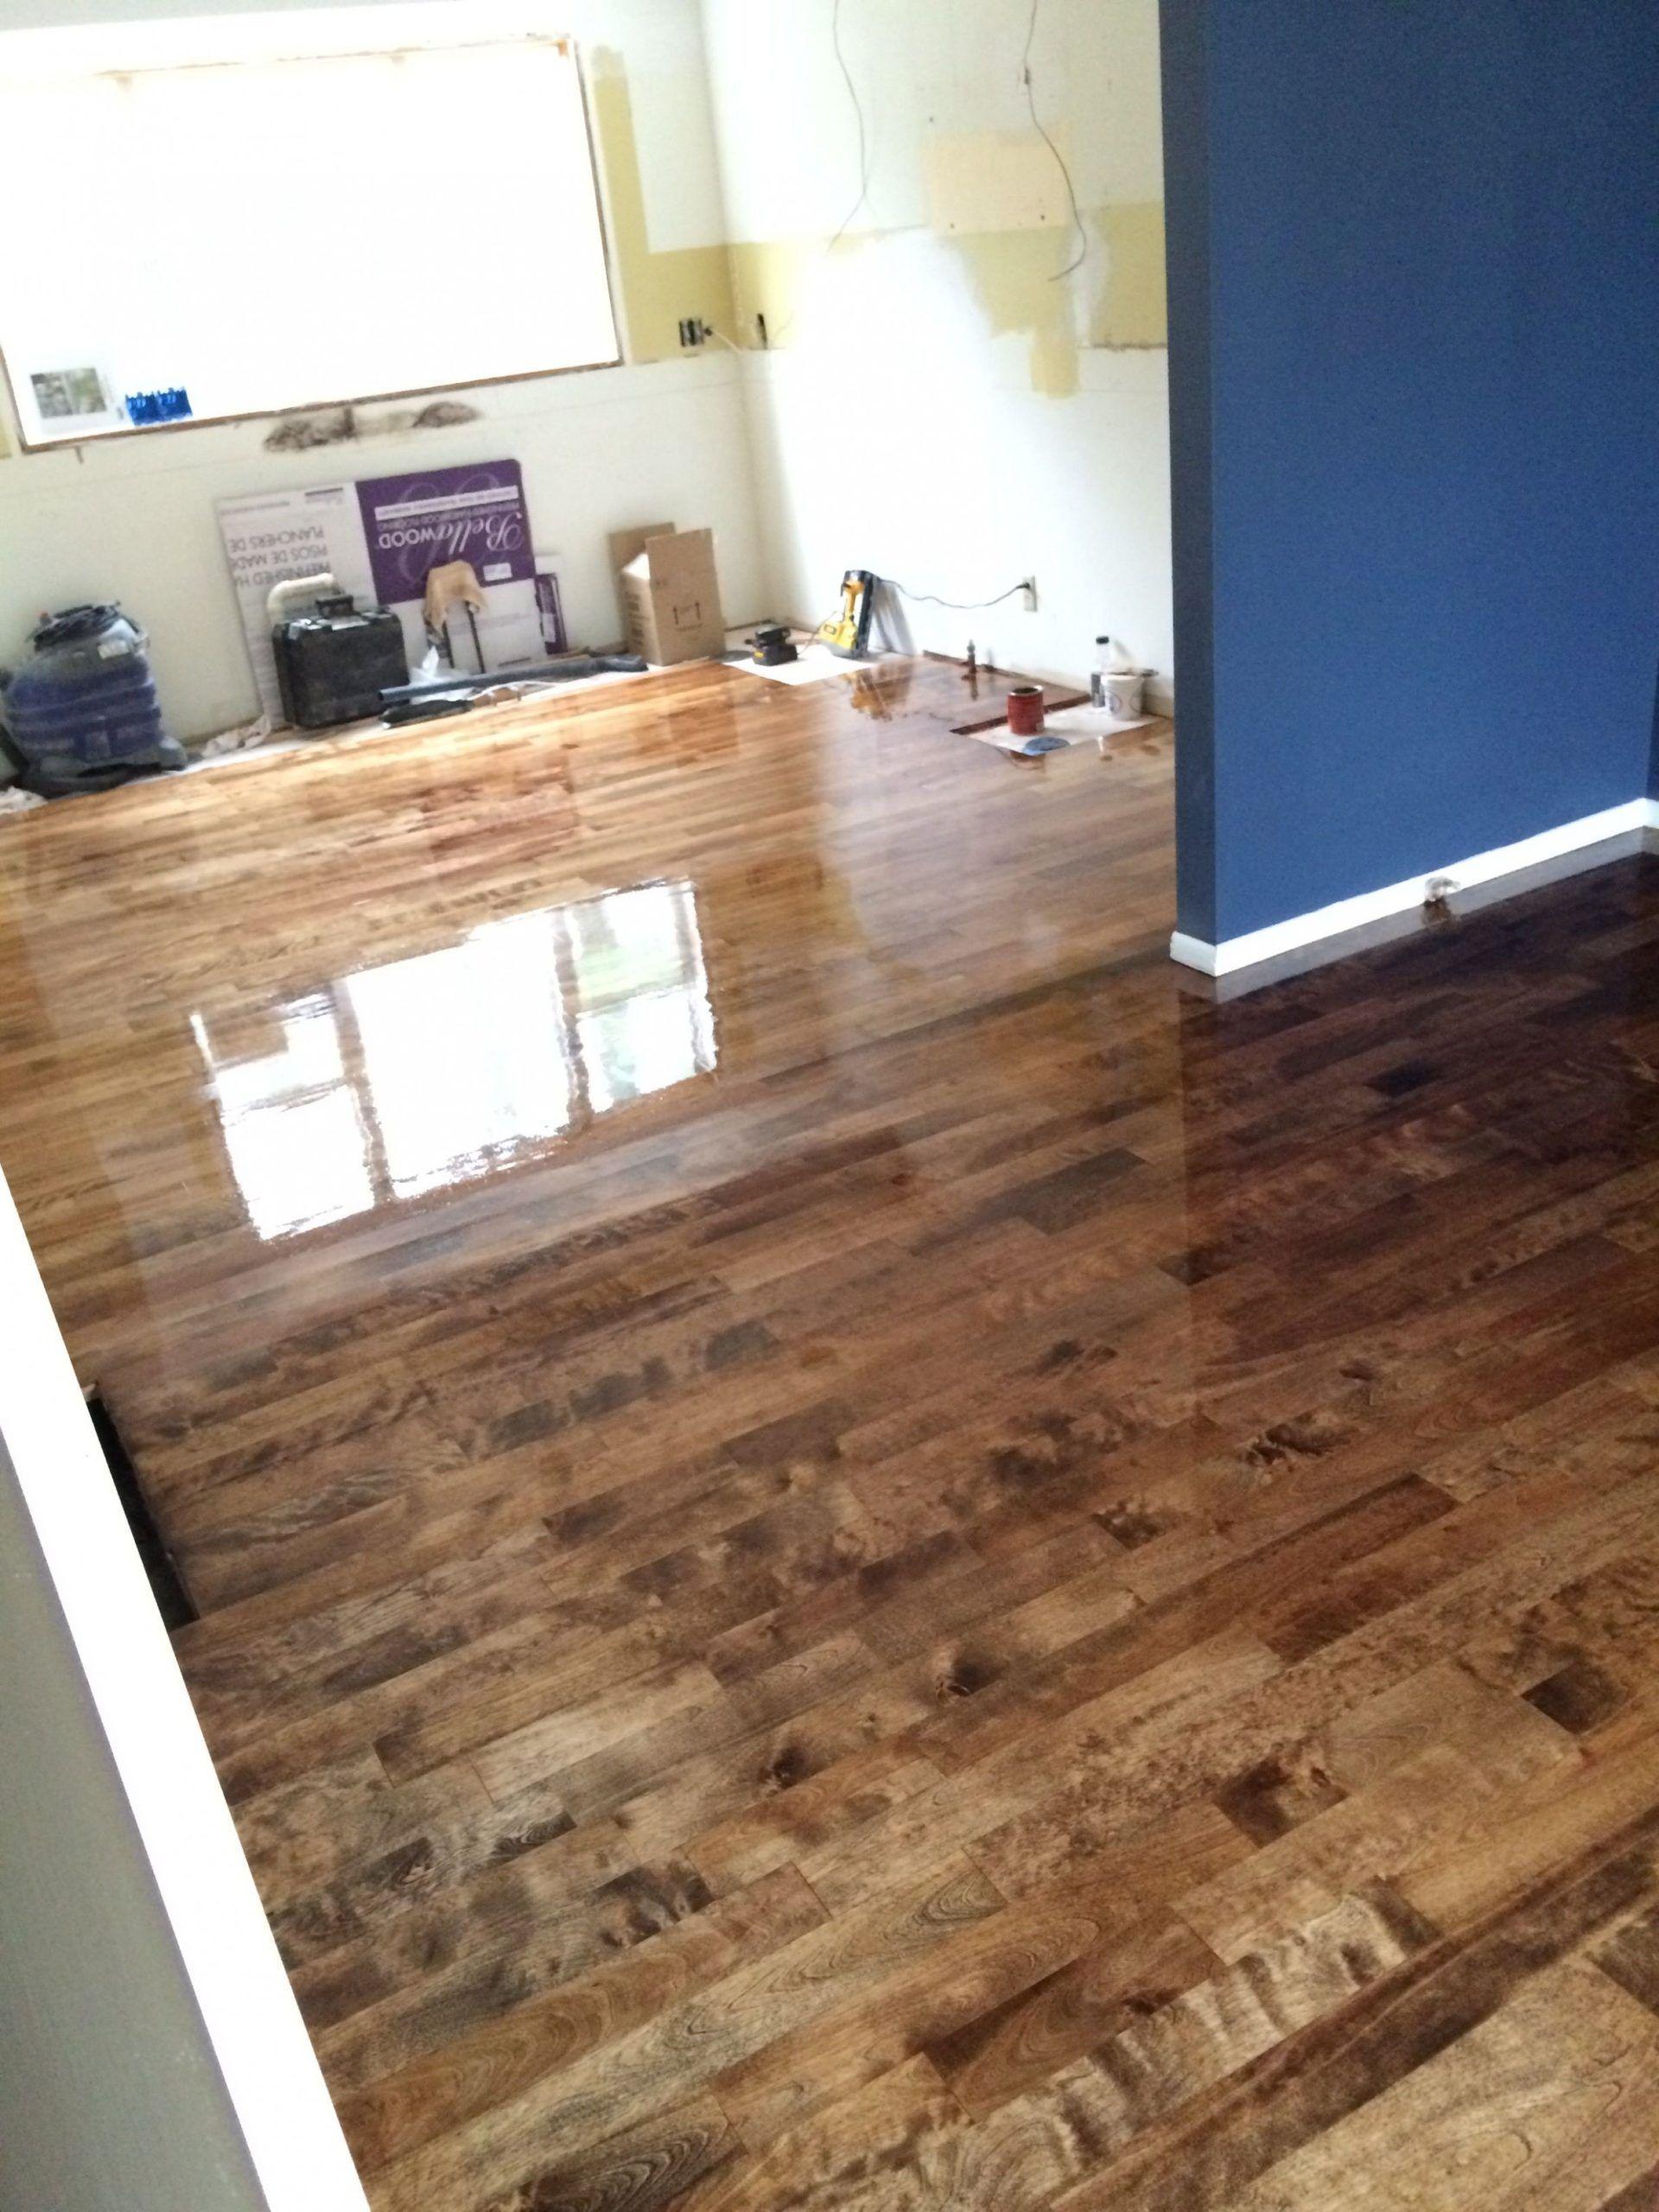 Sealing Wood Floor In Bathroom Is So Famous But Why Sealing Wood Floor In Bathroom Is So Famous But Why Bill Burnett And Kevin In 2020 Wood Floor Bathroom Hardwood